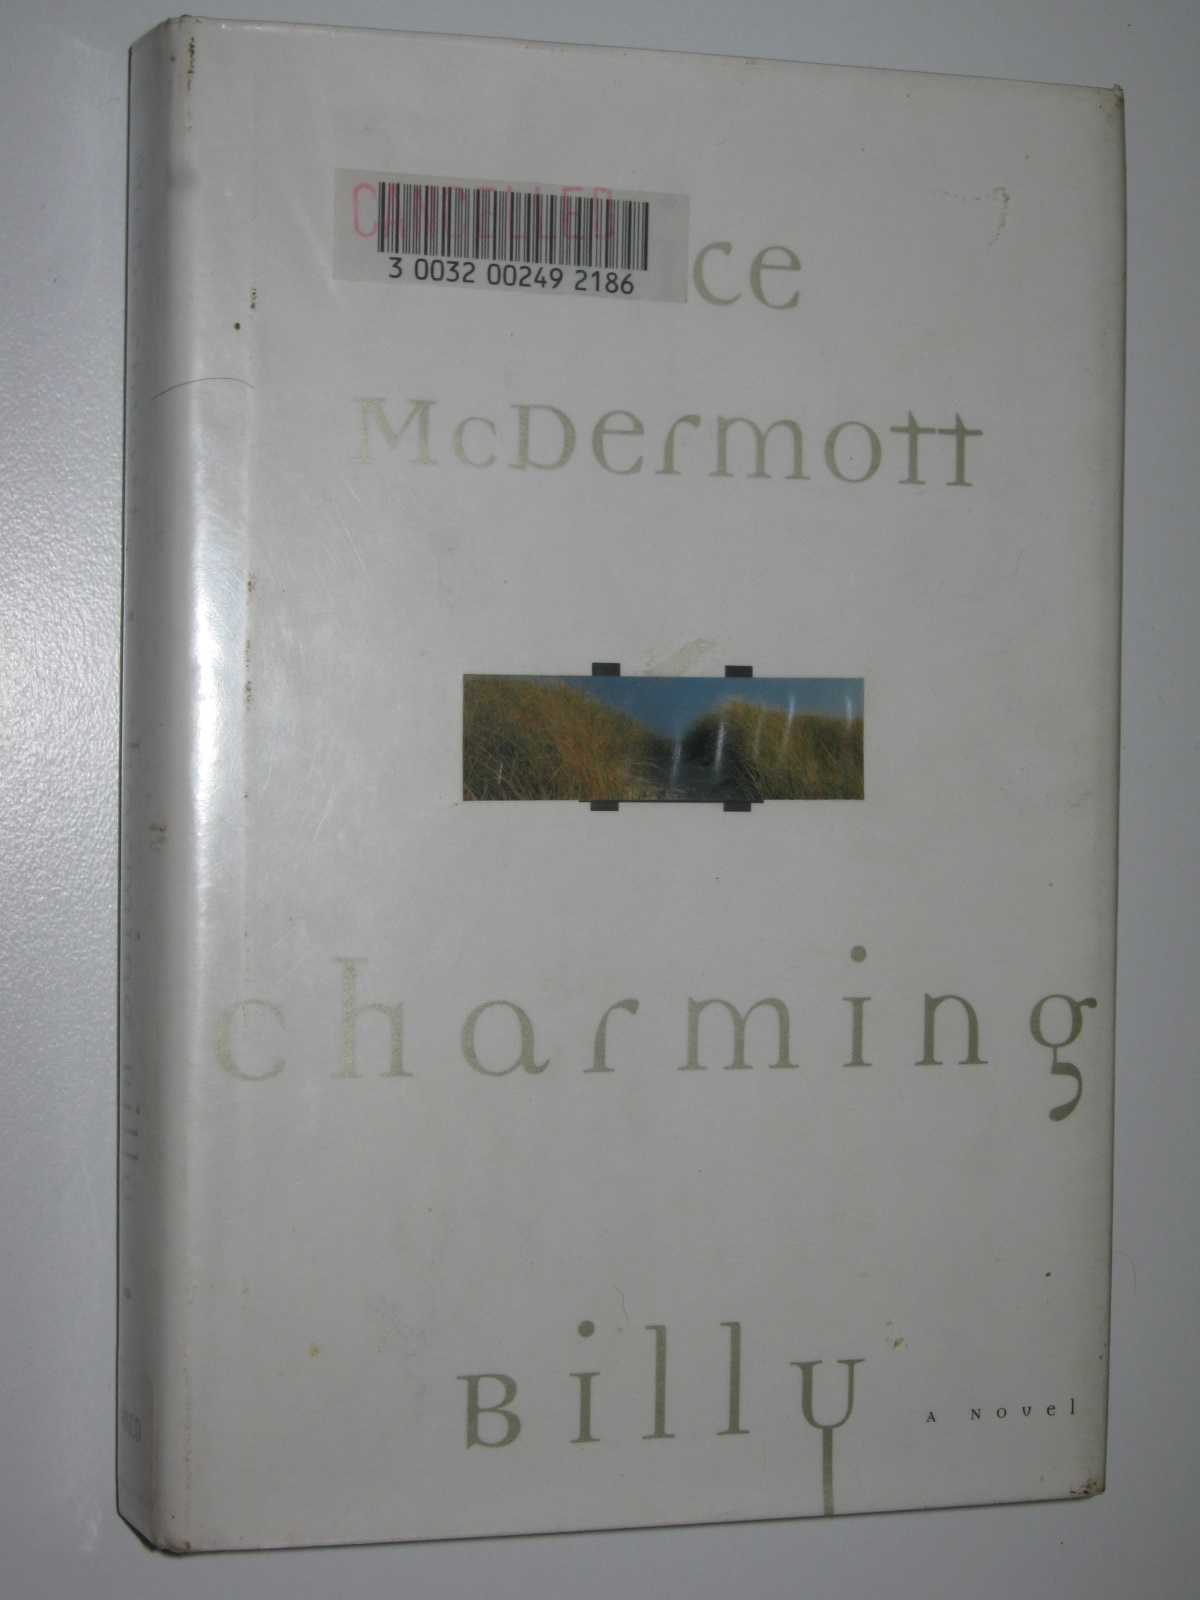 Charming Billy, Alice, McDermott